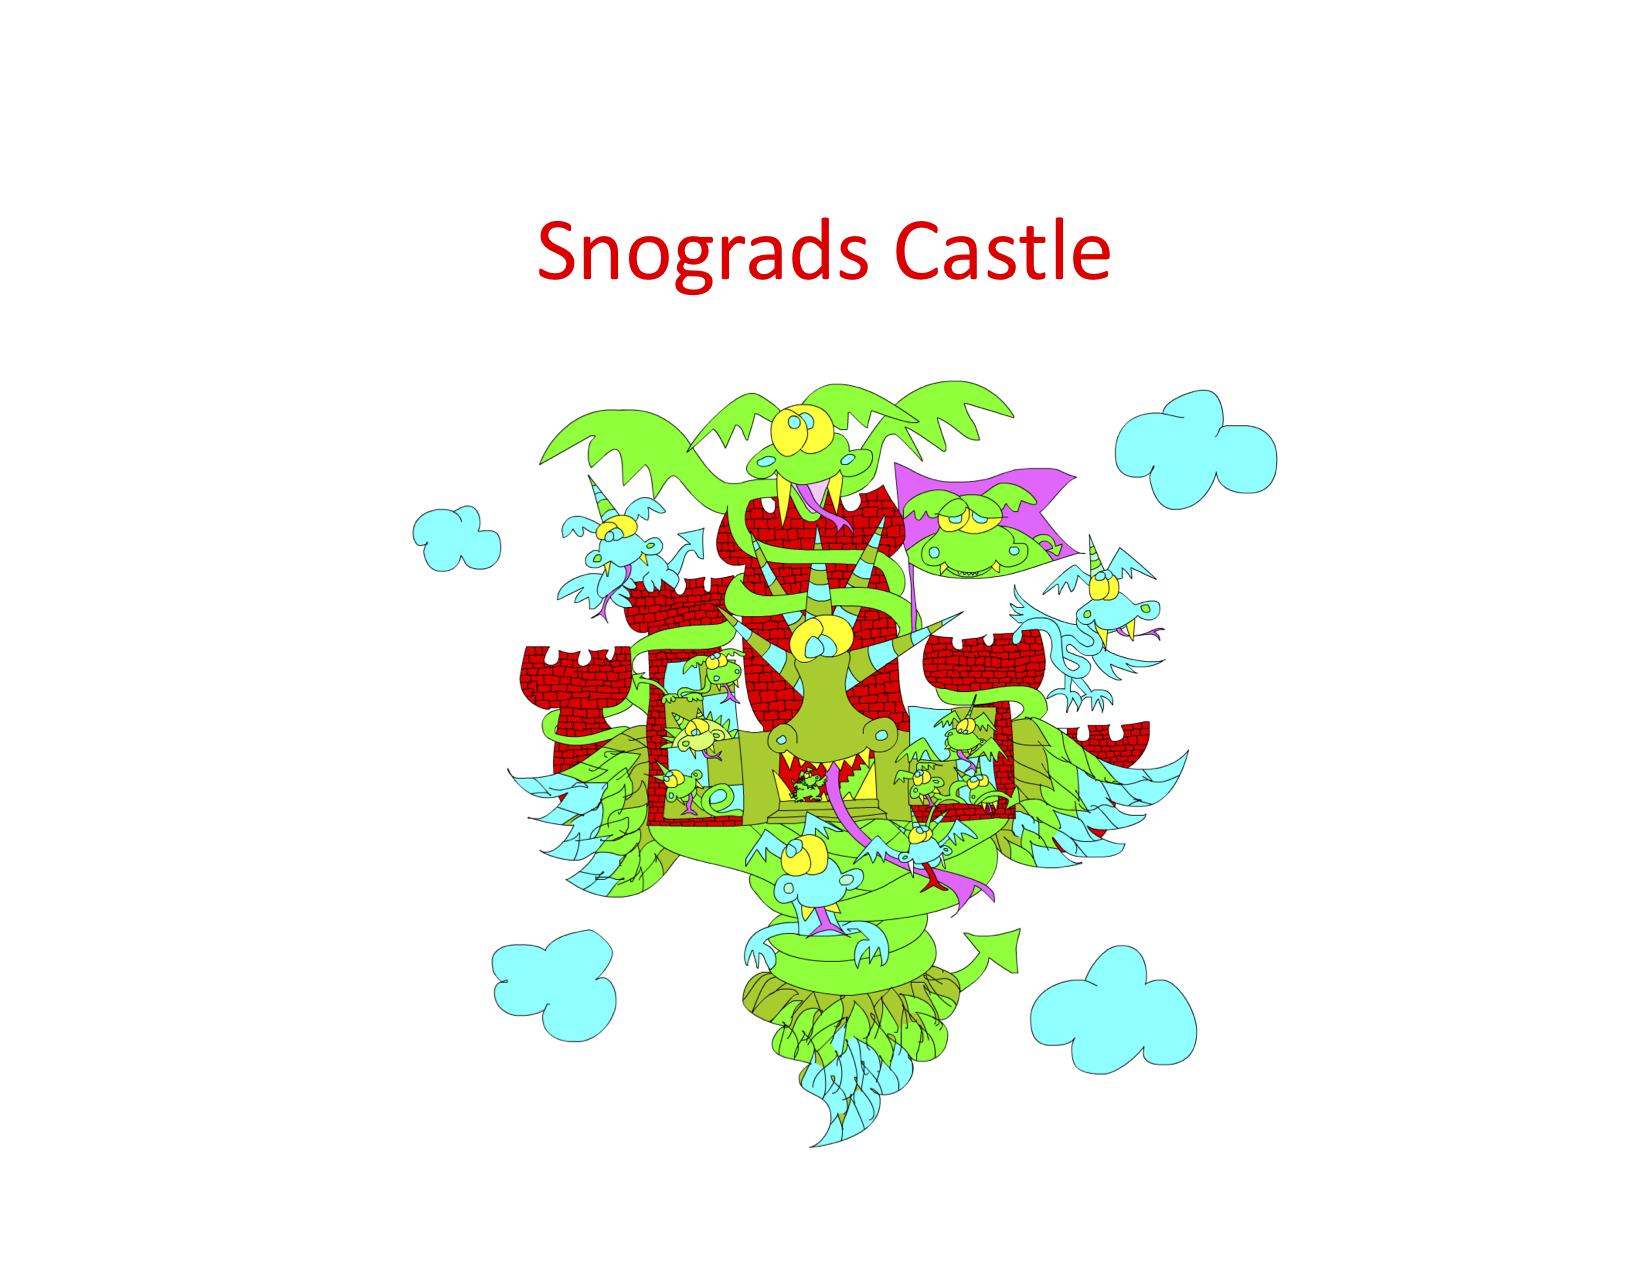 SnogradrsCastleUSE